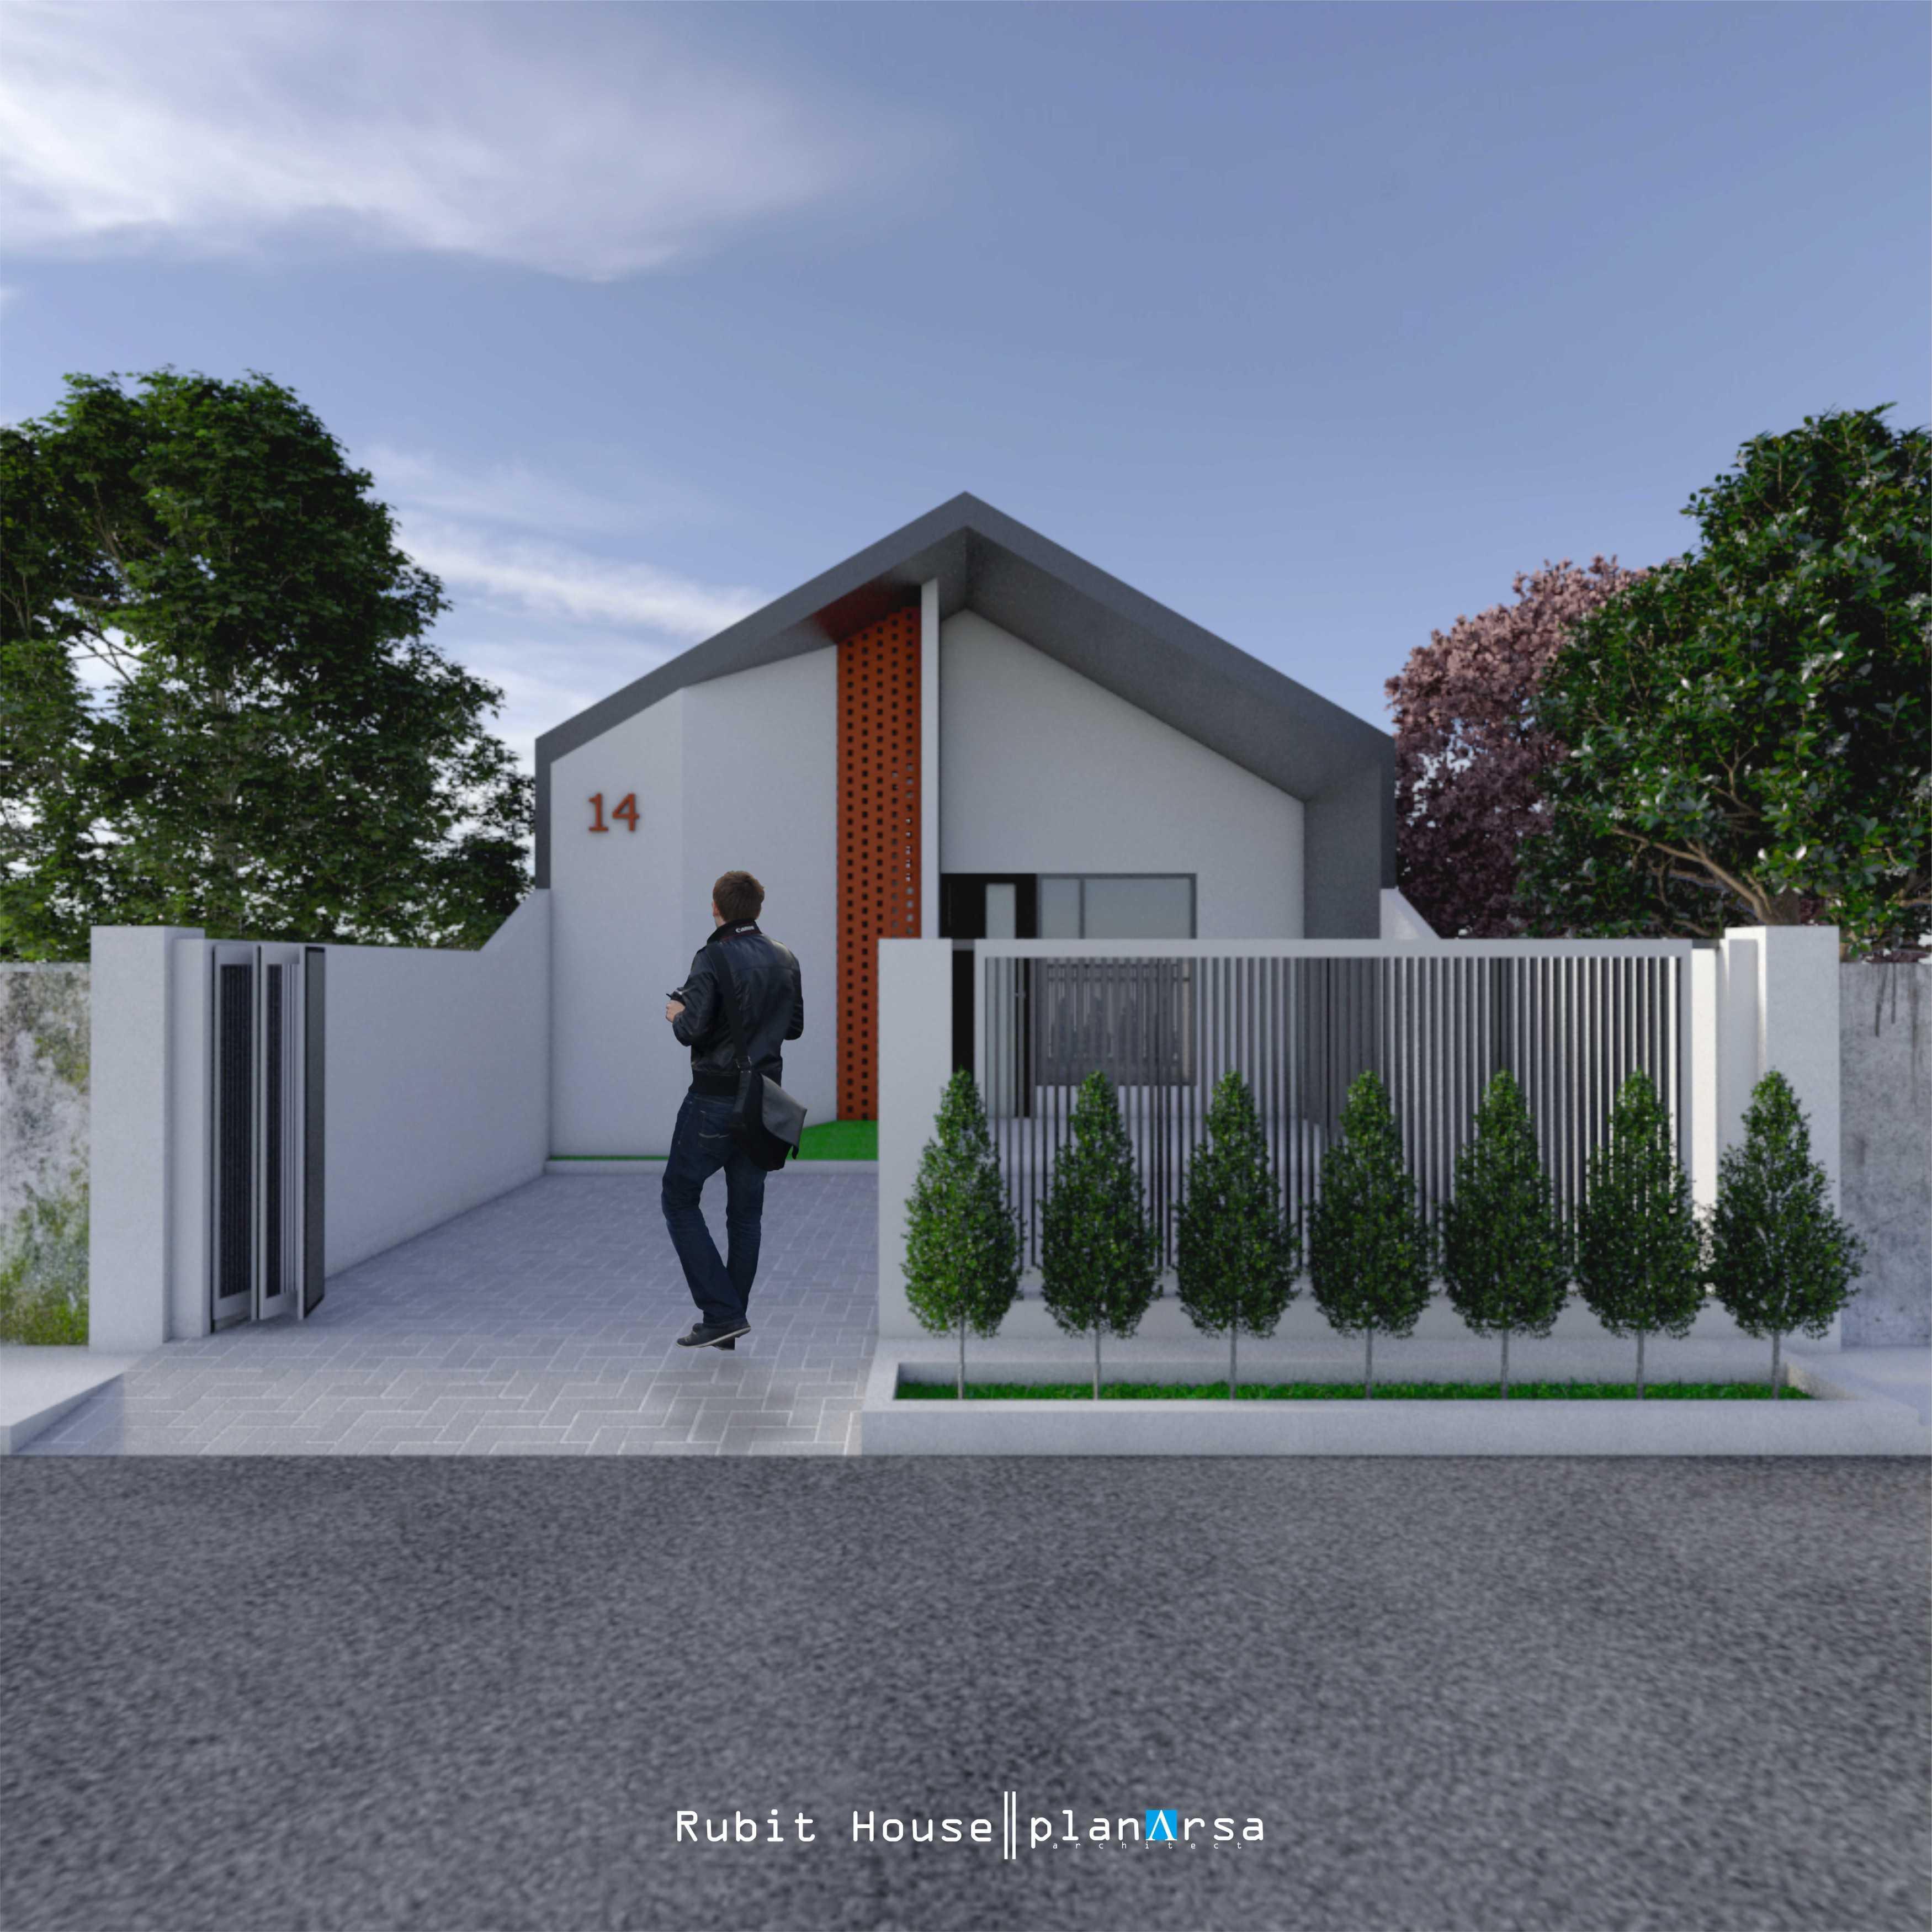 Planarsa Architect Rubit House Aceh, Indonesia Aceh, Indonesia Planarsa-Architect-Rubit-House   79249